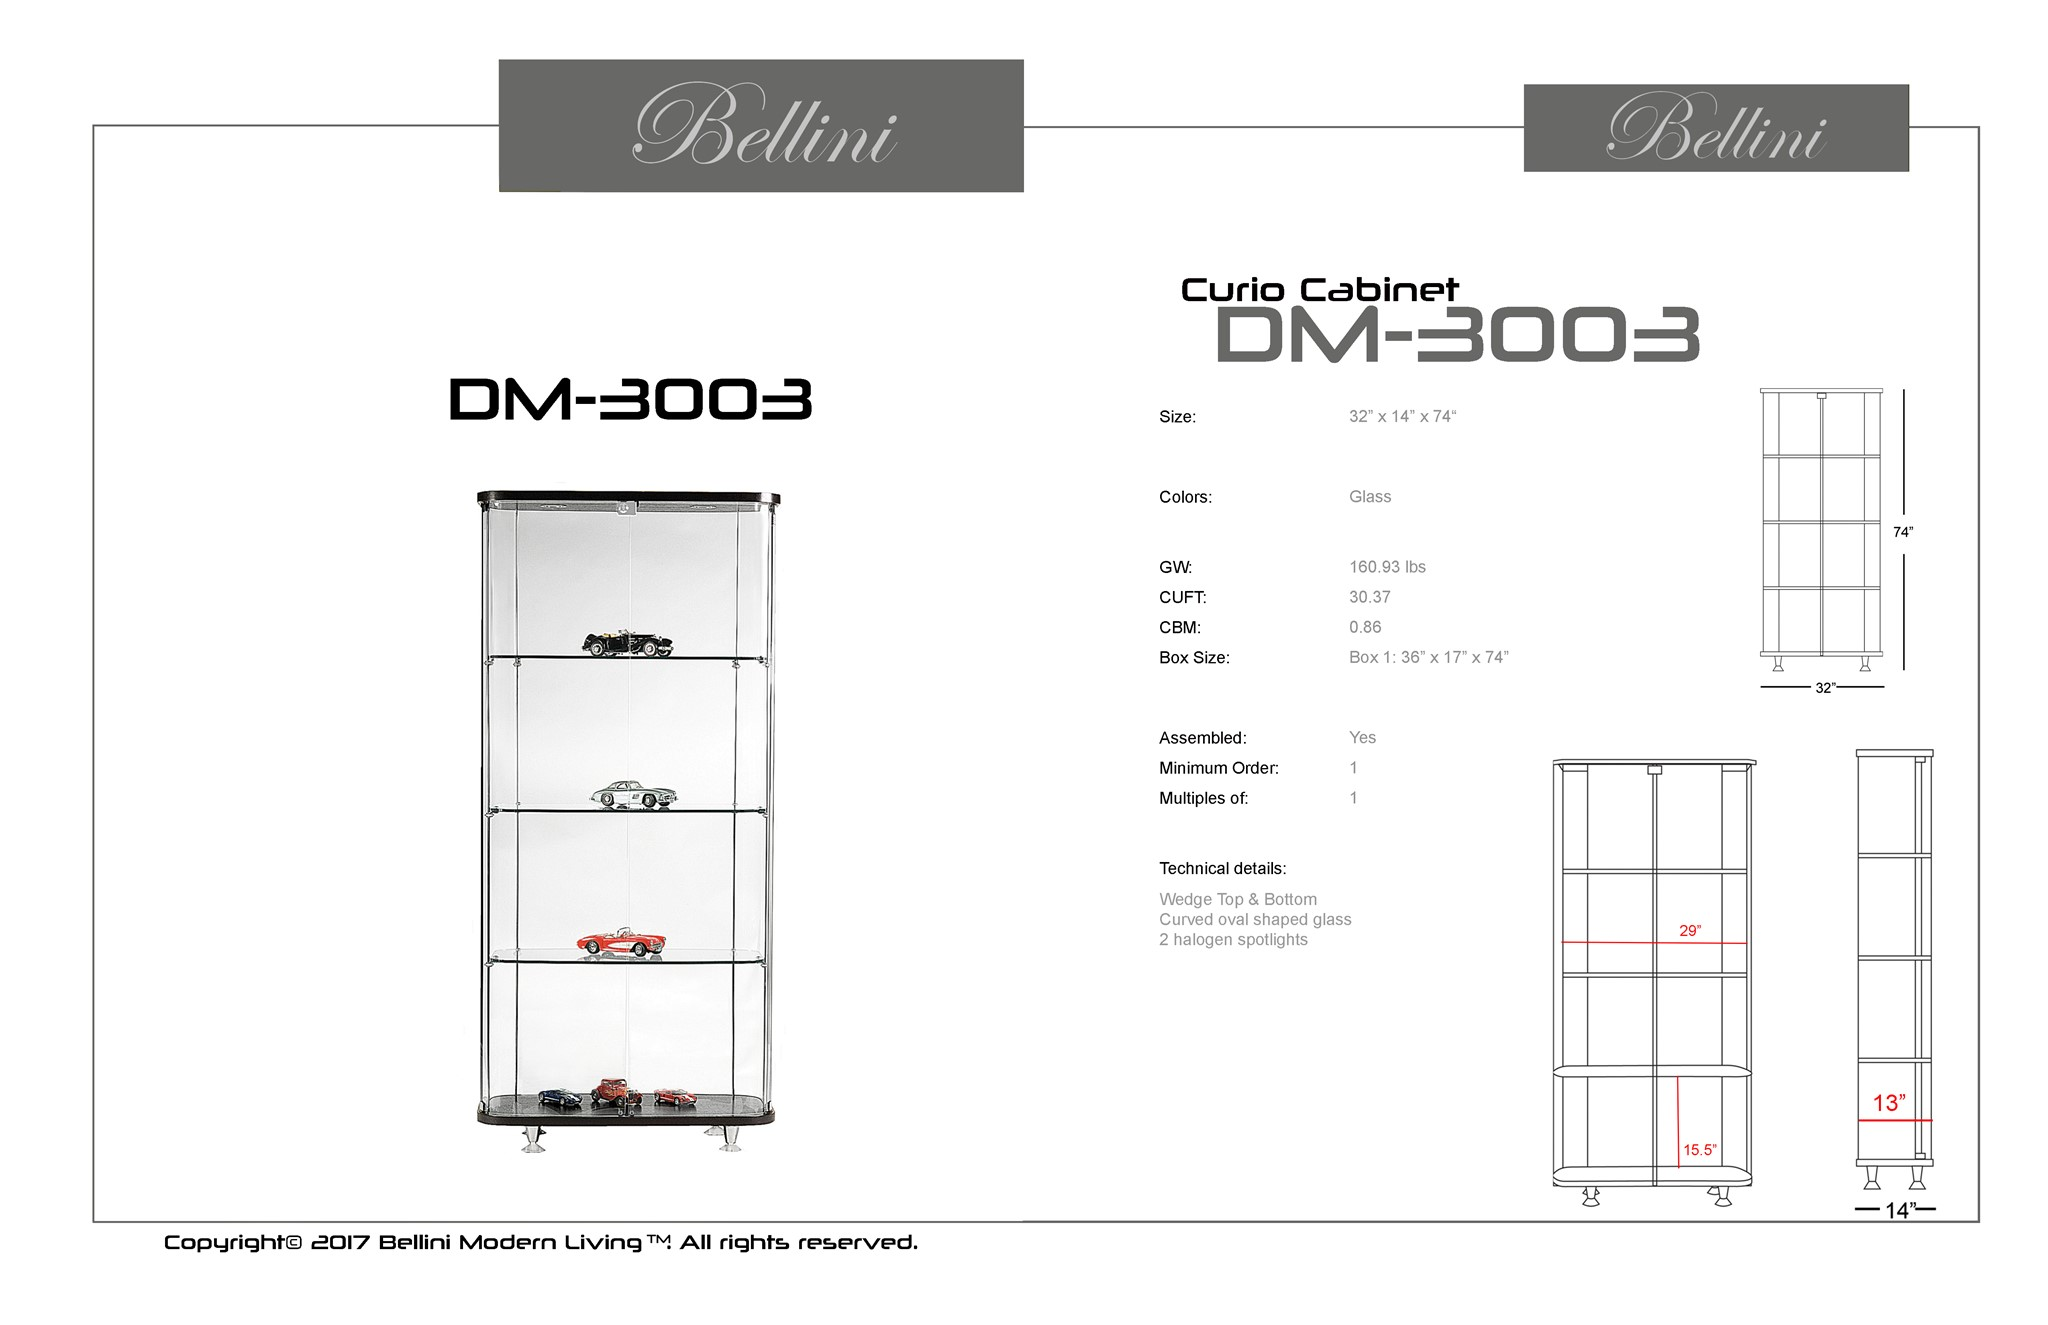 DM-3003